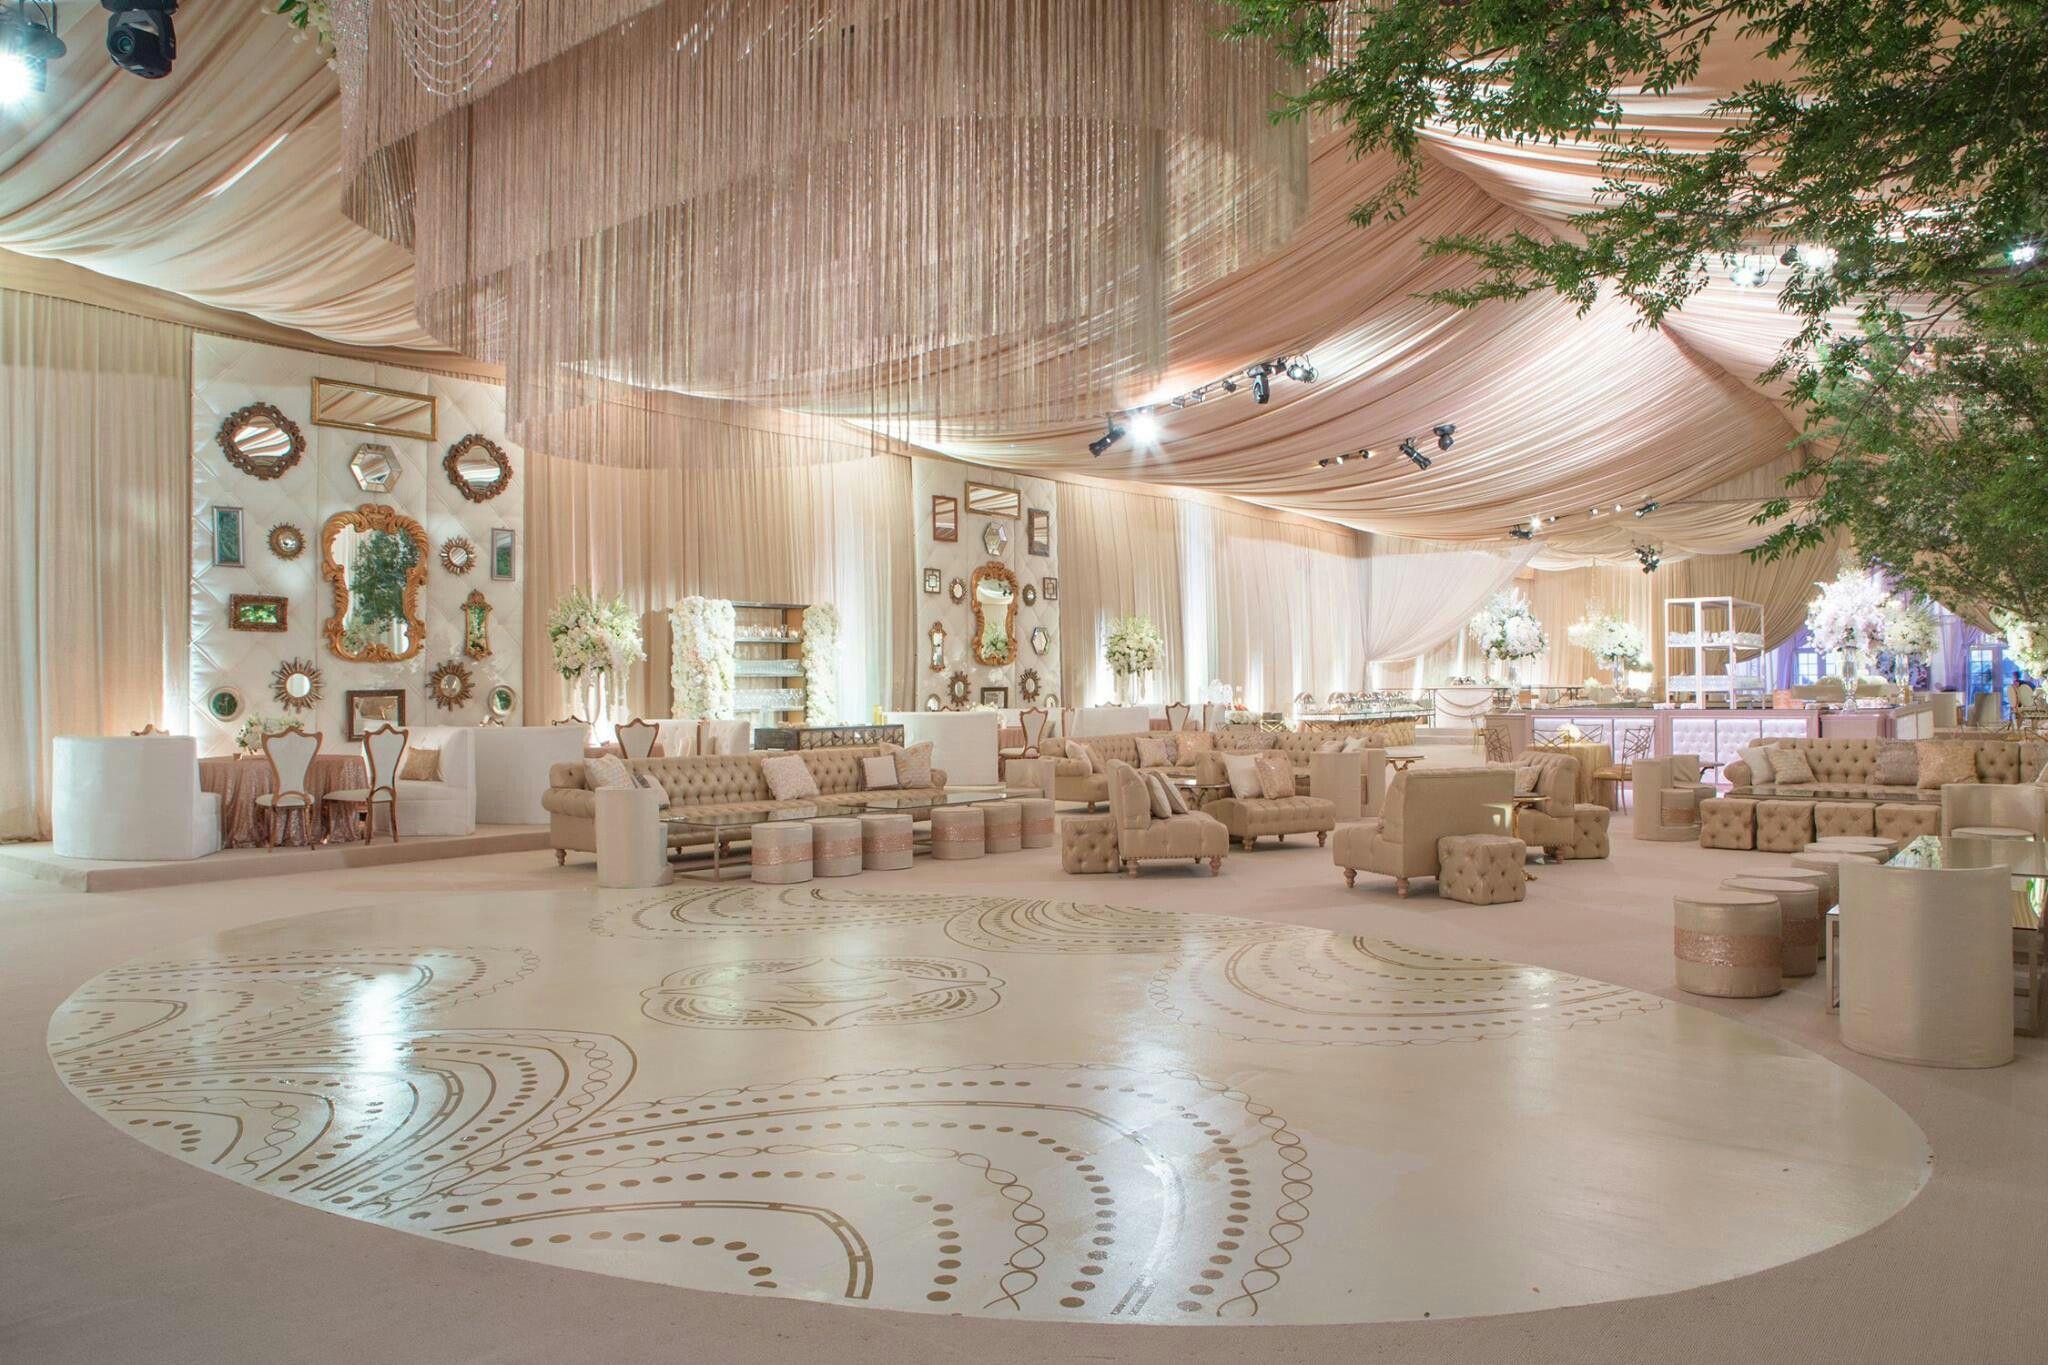 Over the top wedding decorations  Pin by Miranda Johnson on wedding receptions  Pinterest  Weddings